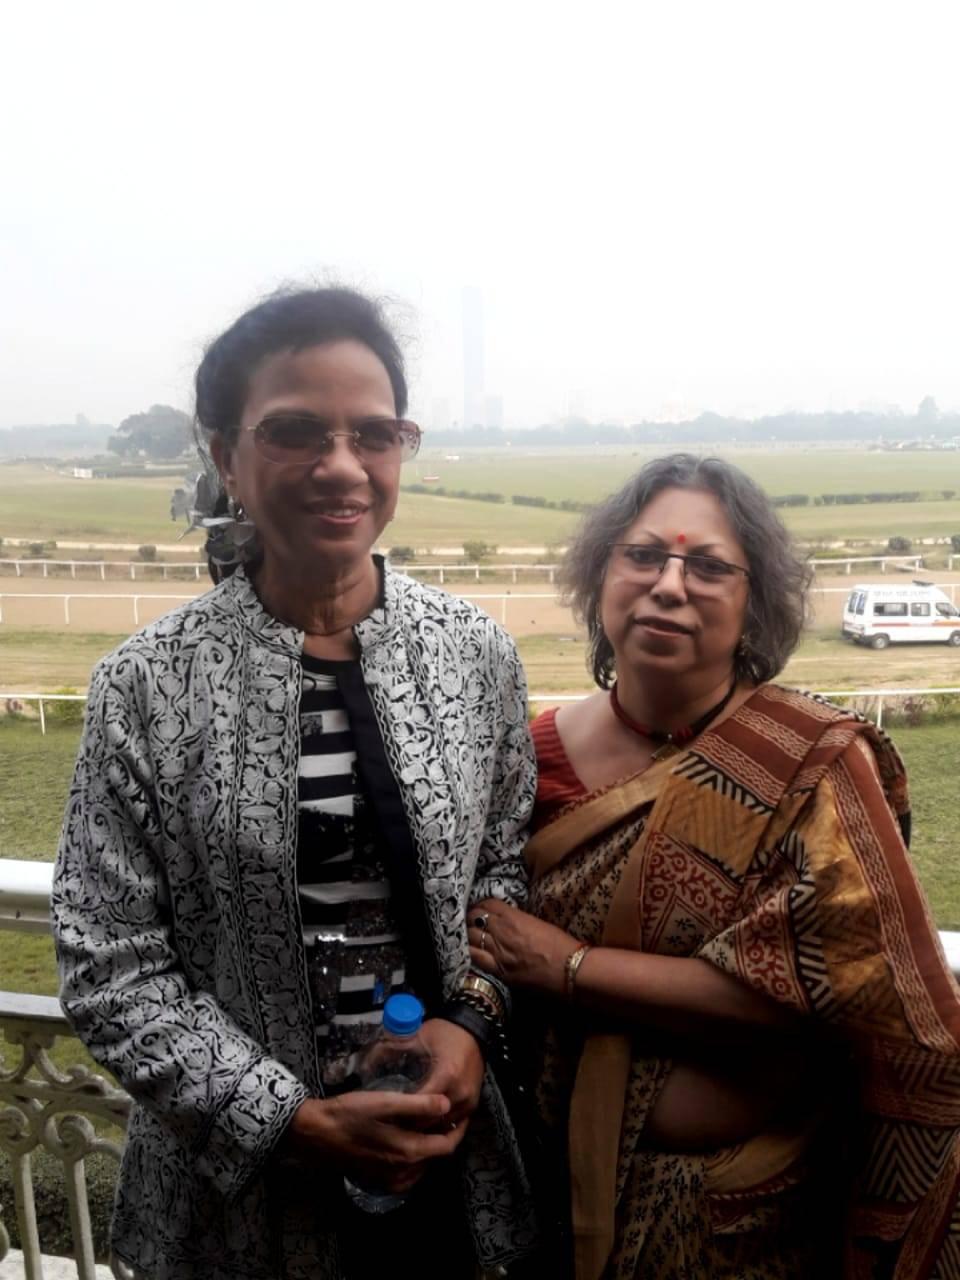 Neeru Poddar and Ratnottama Sengupta.